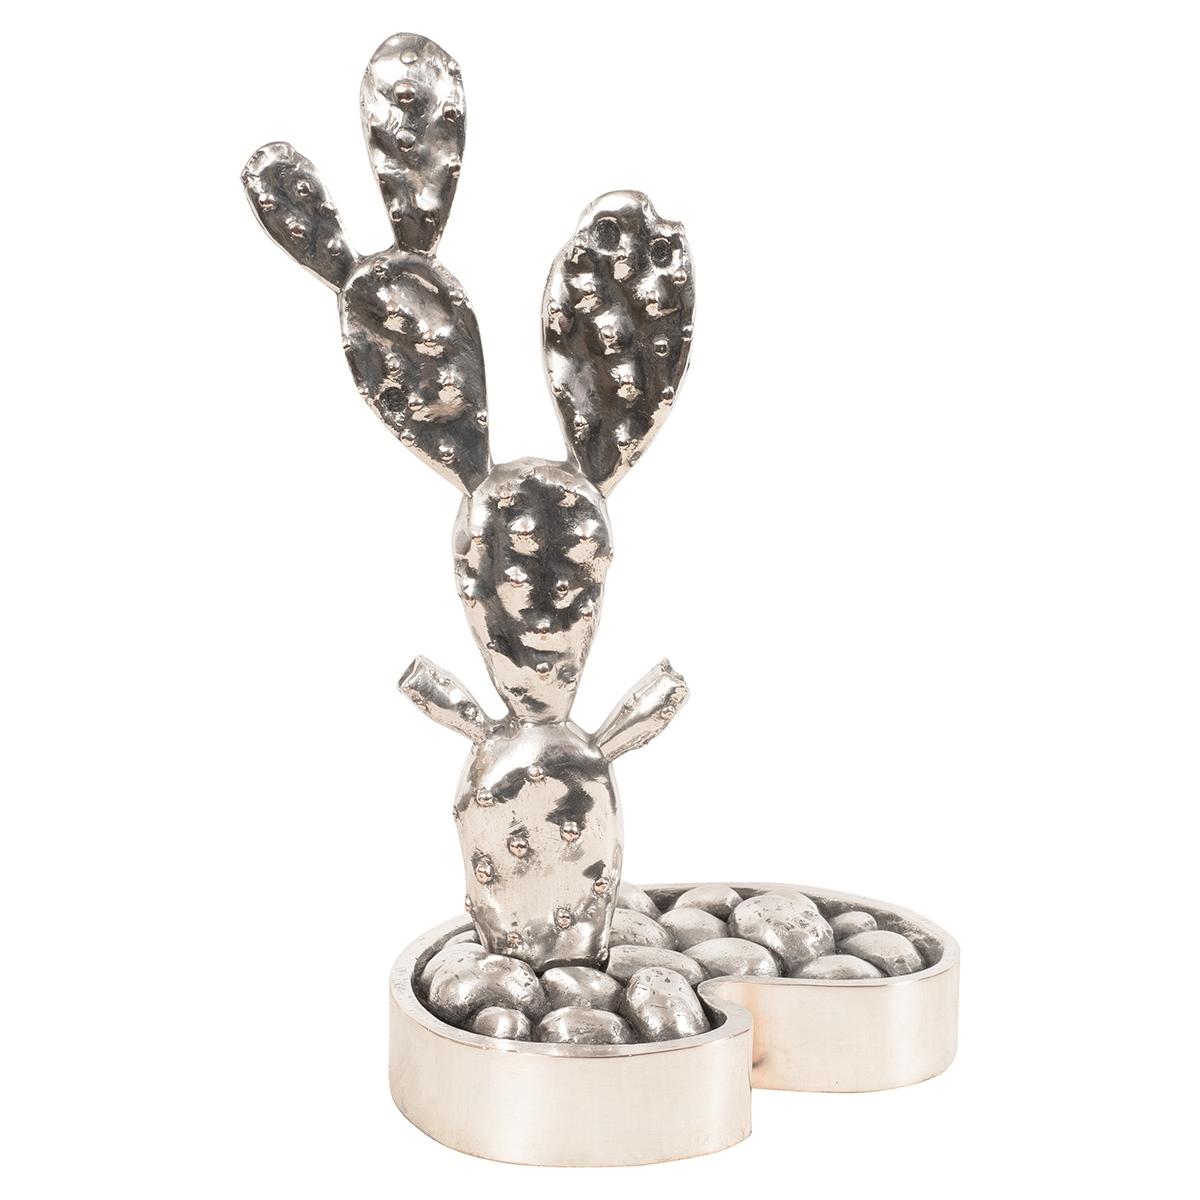 Metal Cactus Sculpture With Brass Details | Sculptures | John Salibello regarding Cacti Brass Coffee Tables (Image 21 of 30)